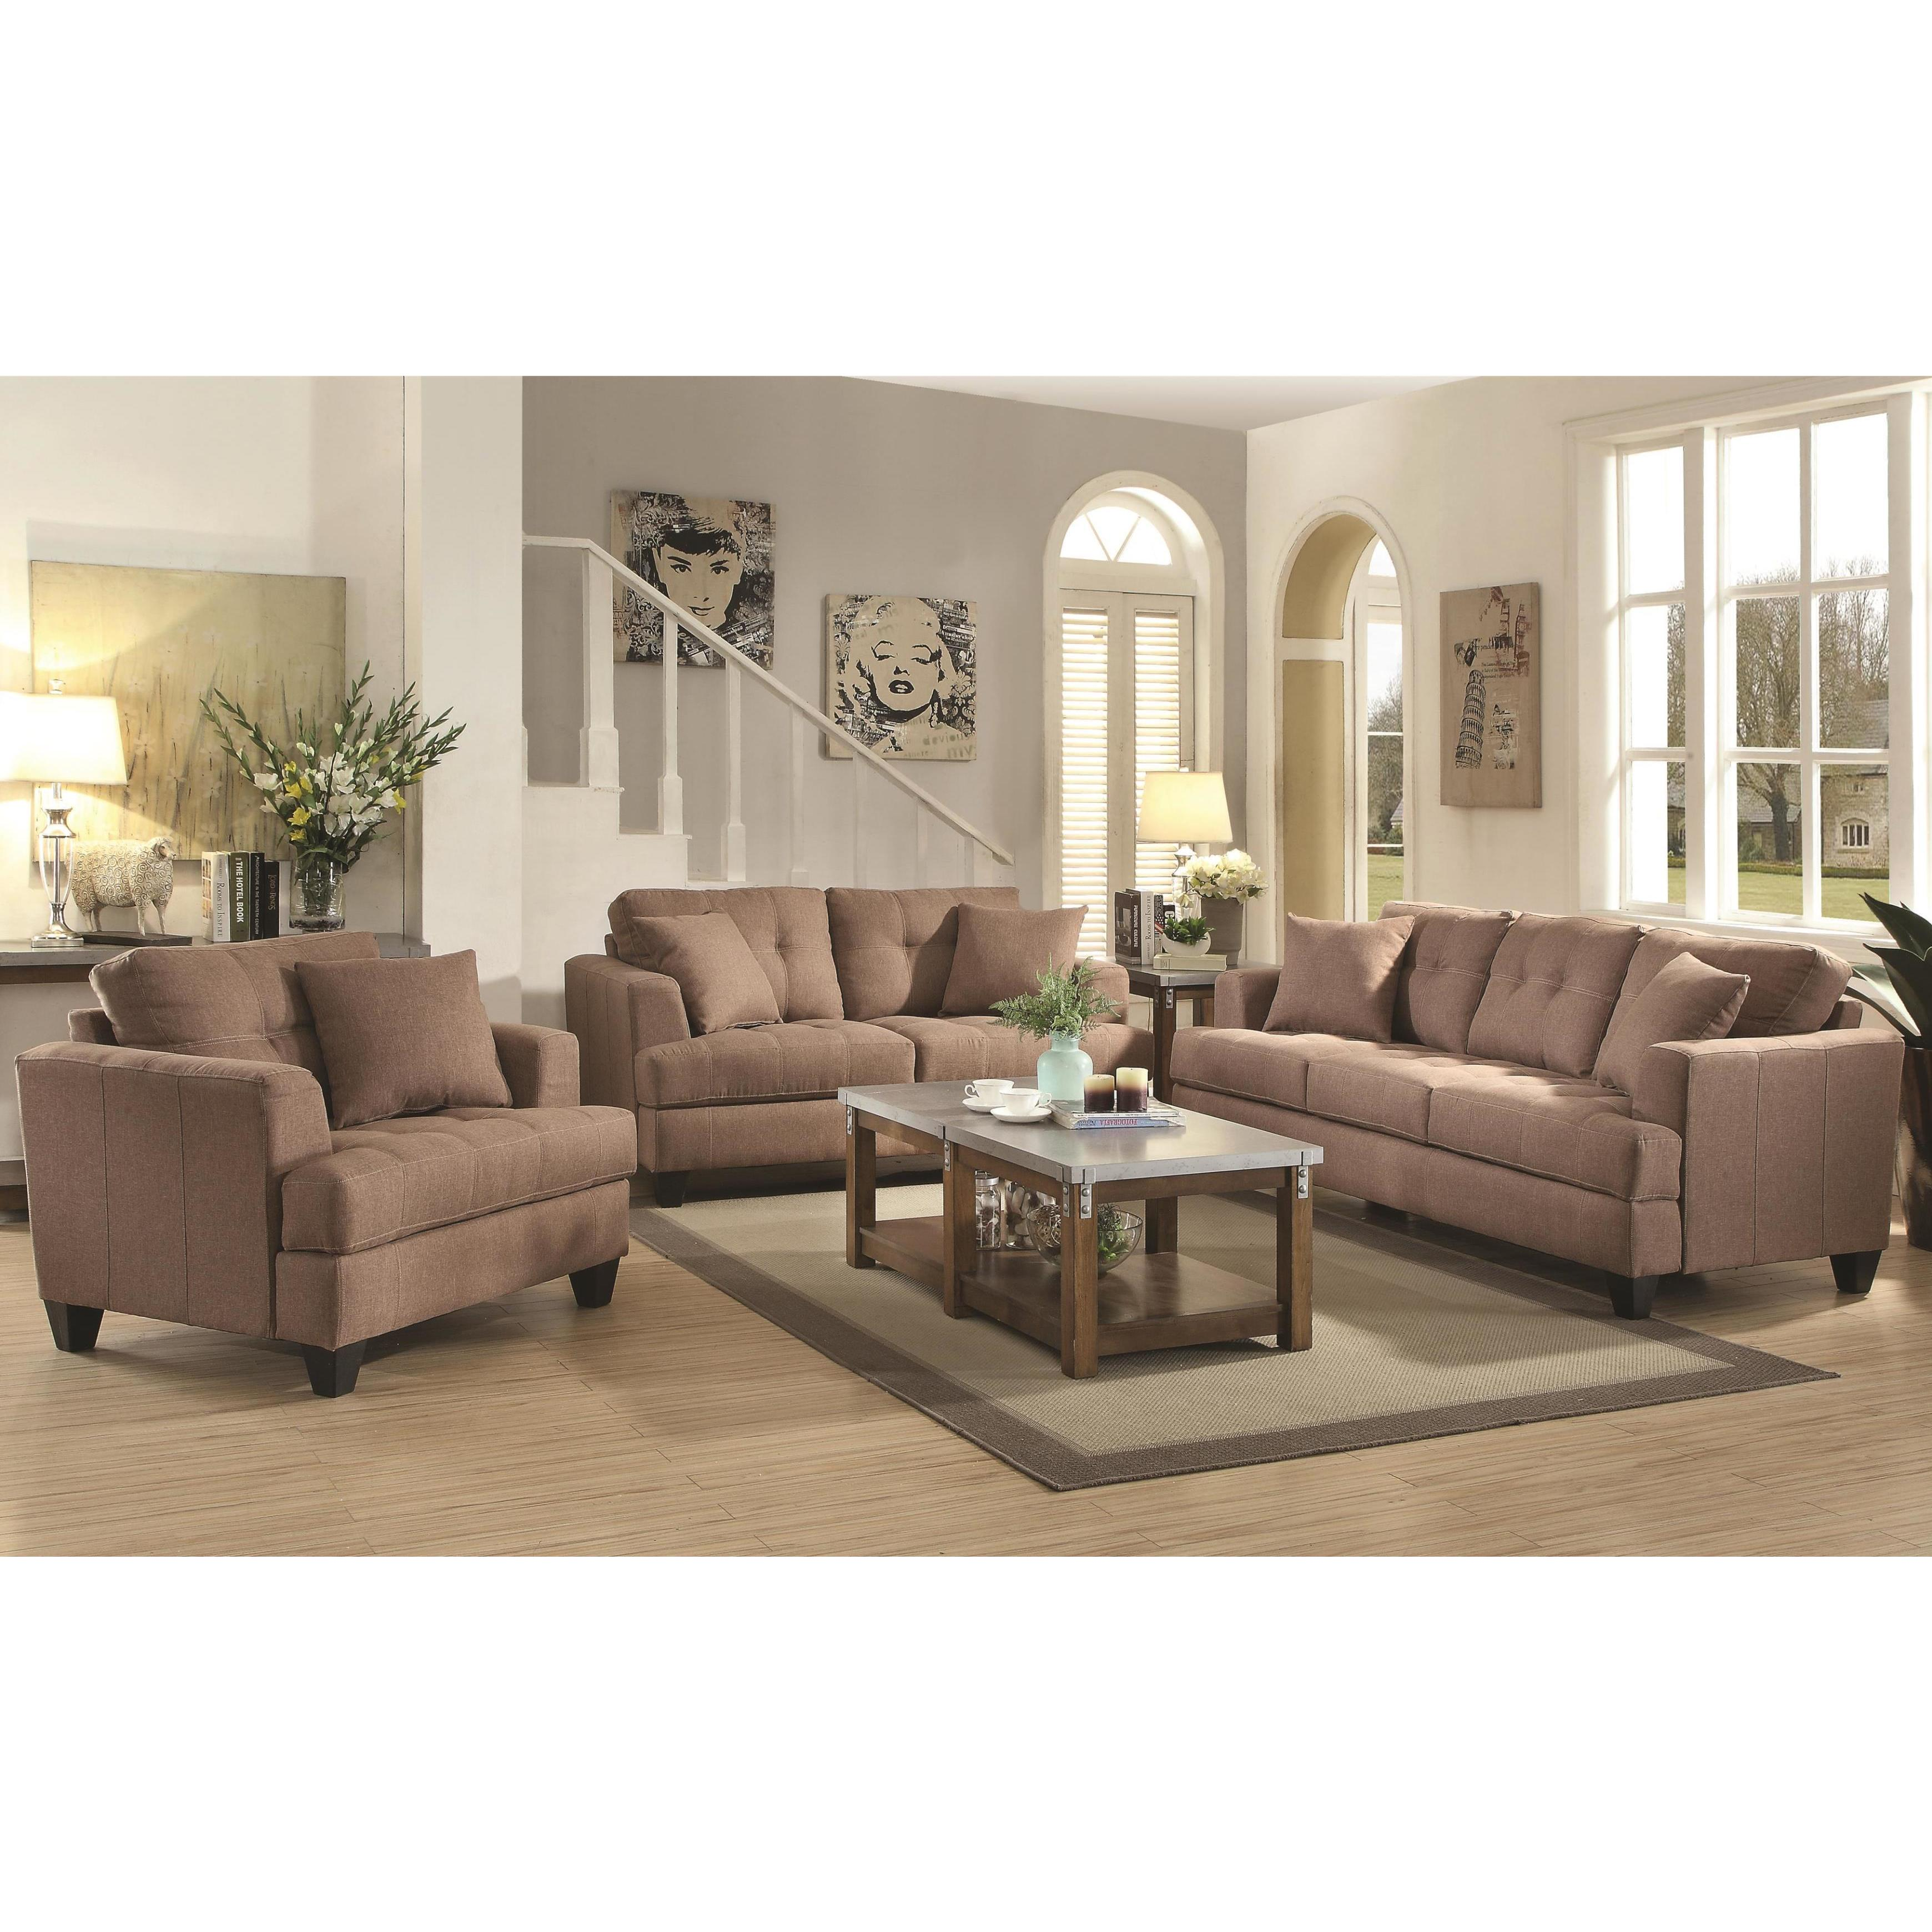 Frankfurt Modern Tufted Design Mocha Living Room Sofa Collection